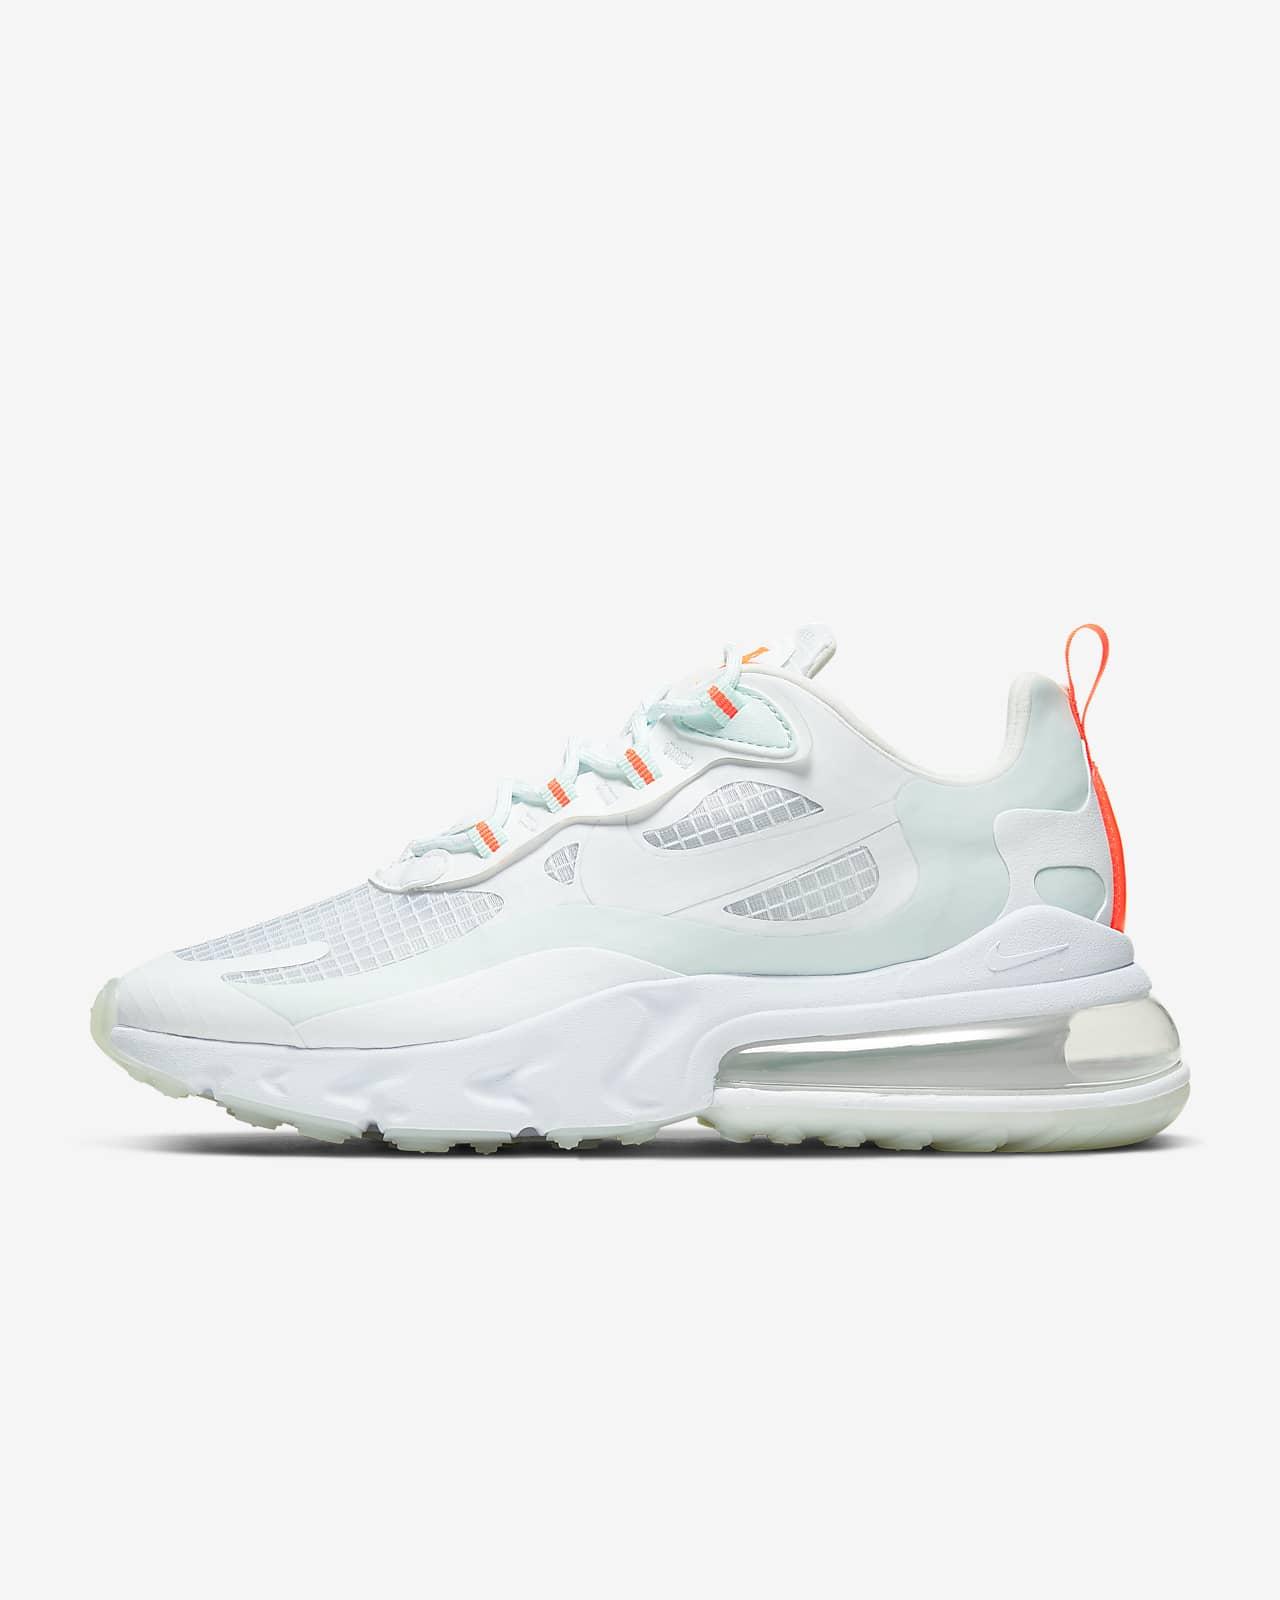 Nike Air Max 270 React SE 女子运动鞋